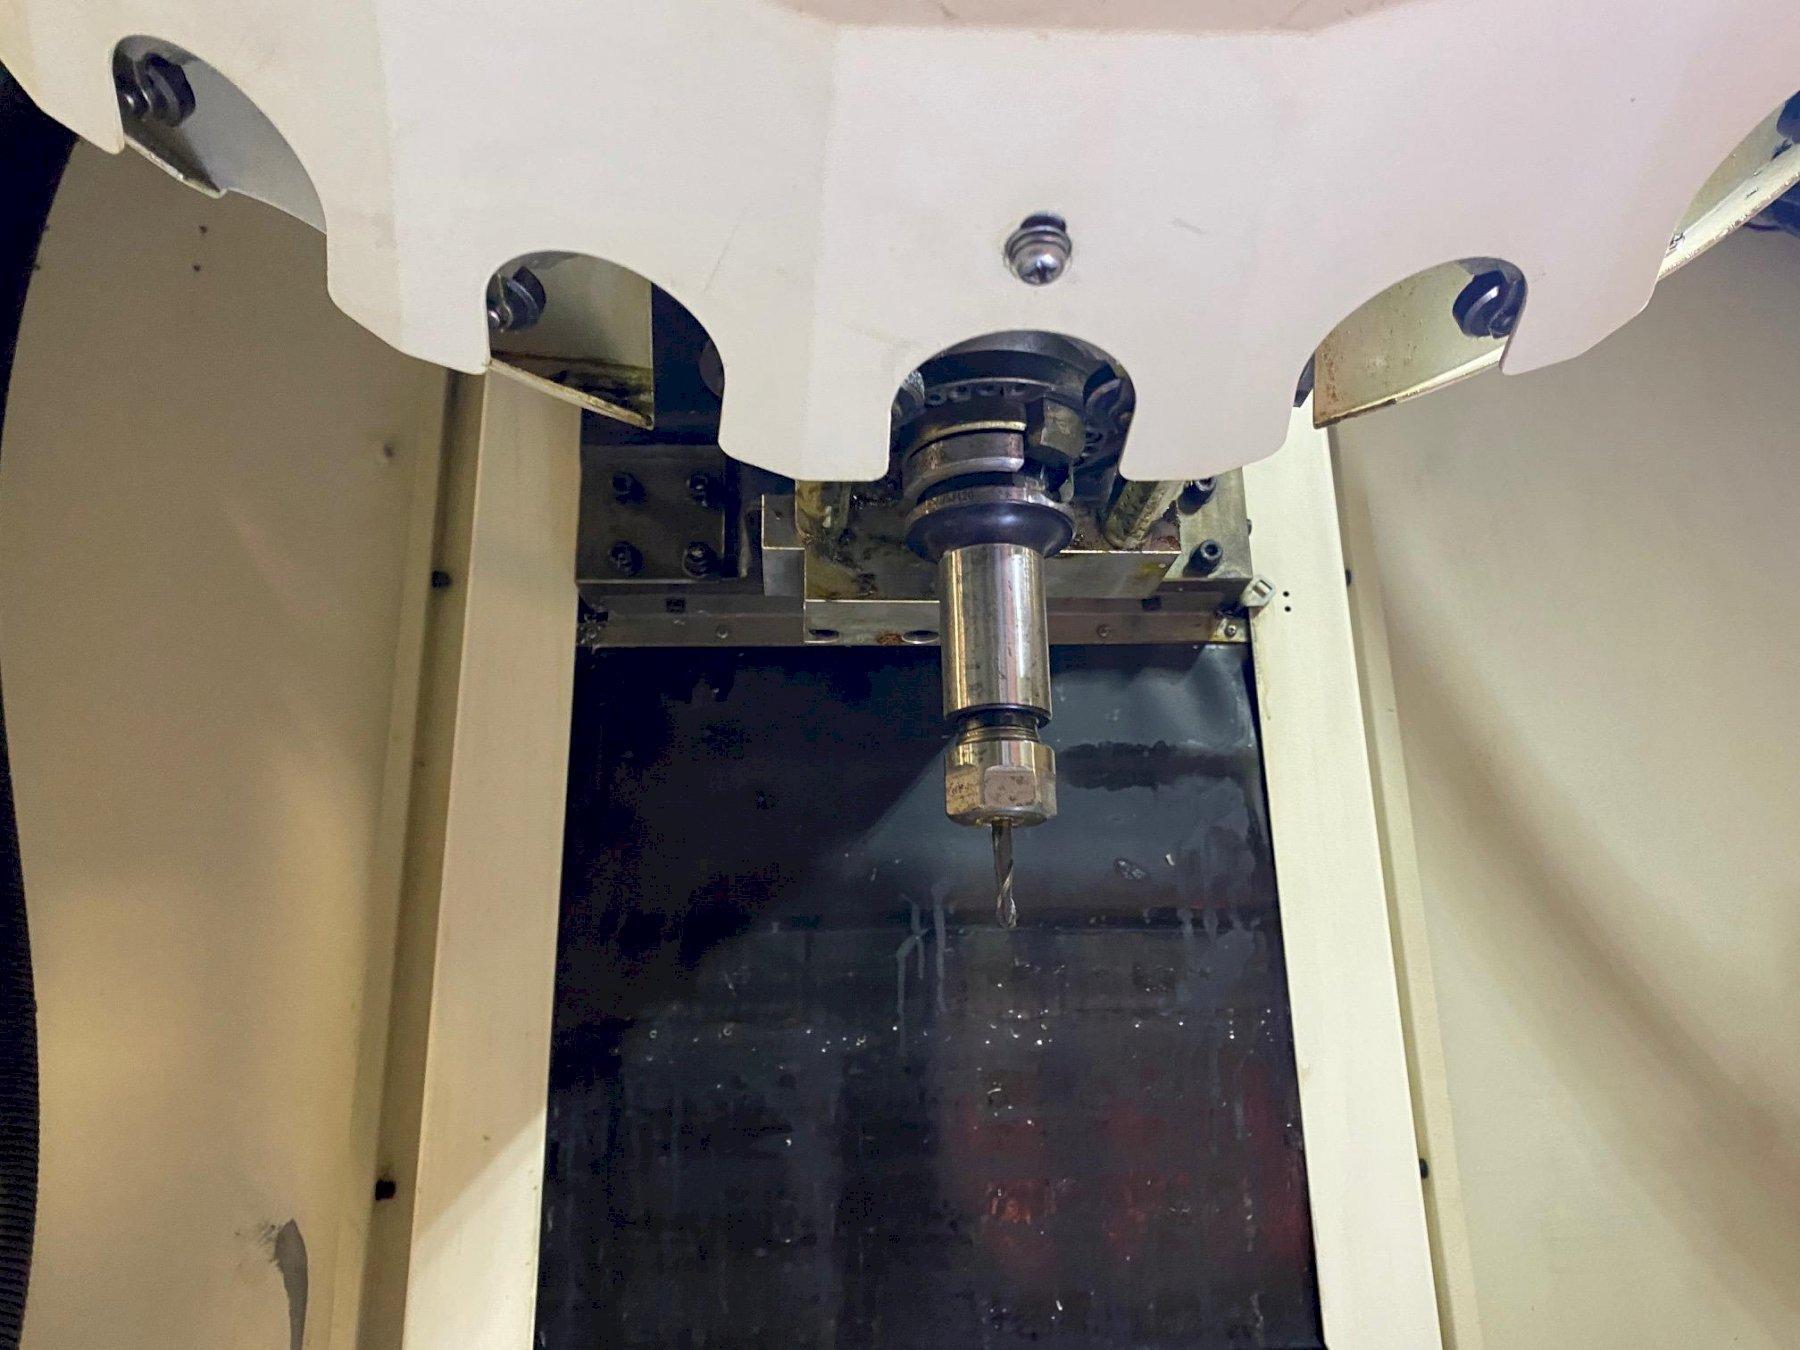 2017 FANUC Robodrill a-D21MiA - Vertical Machining Center